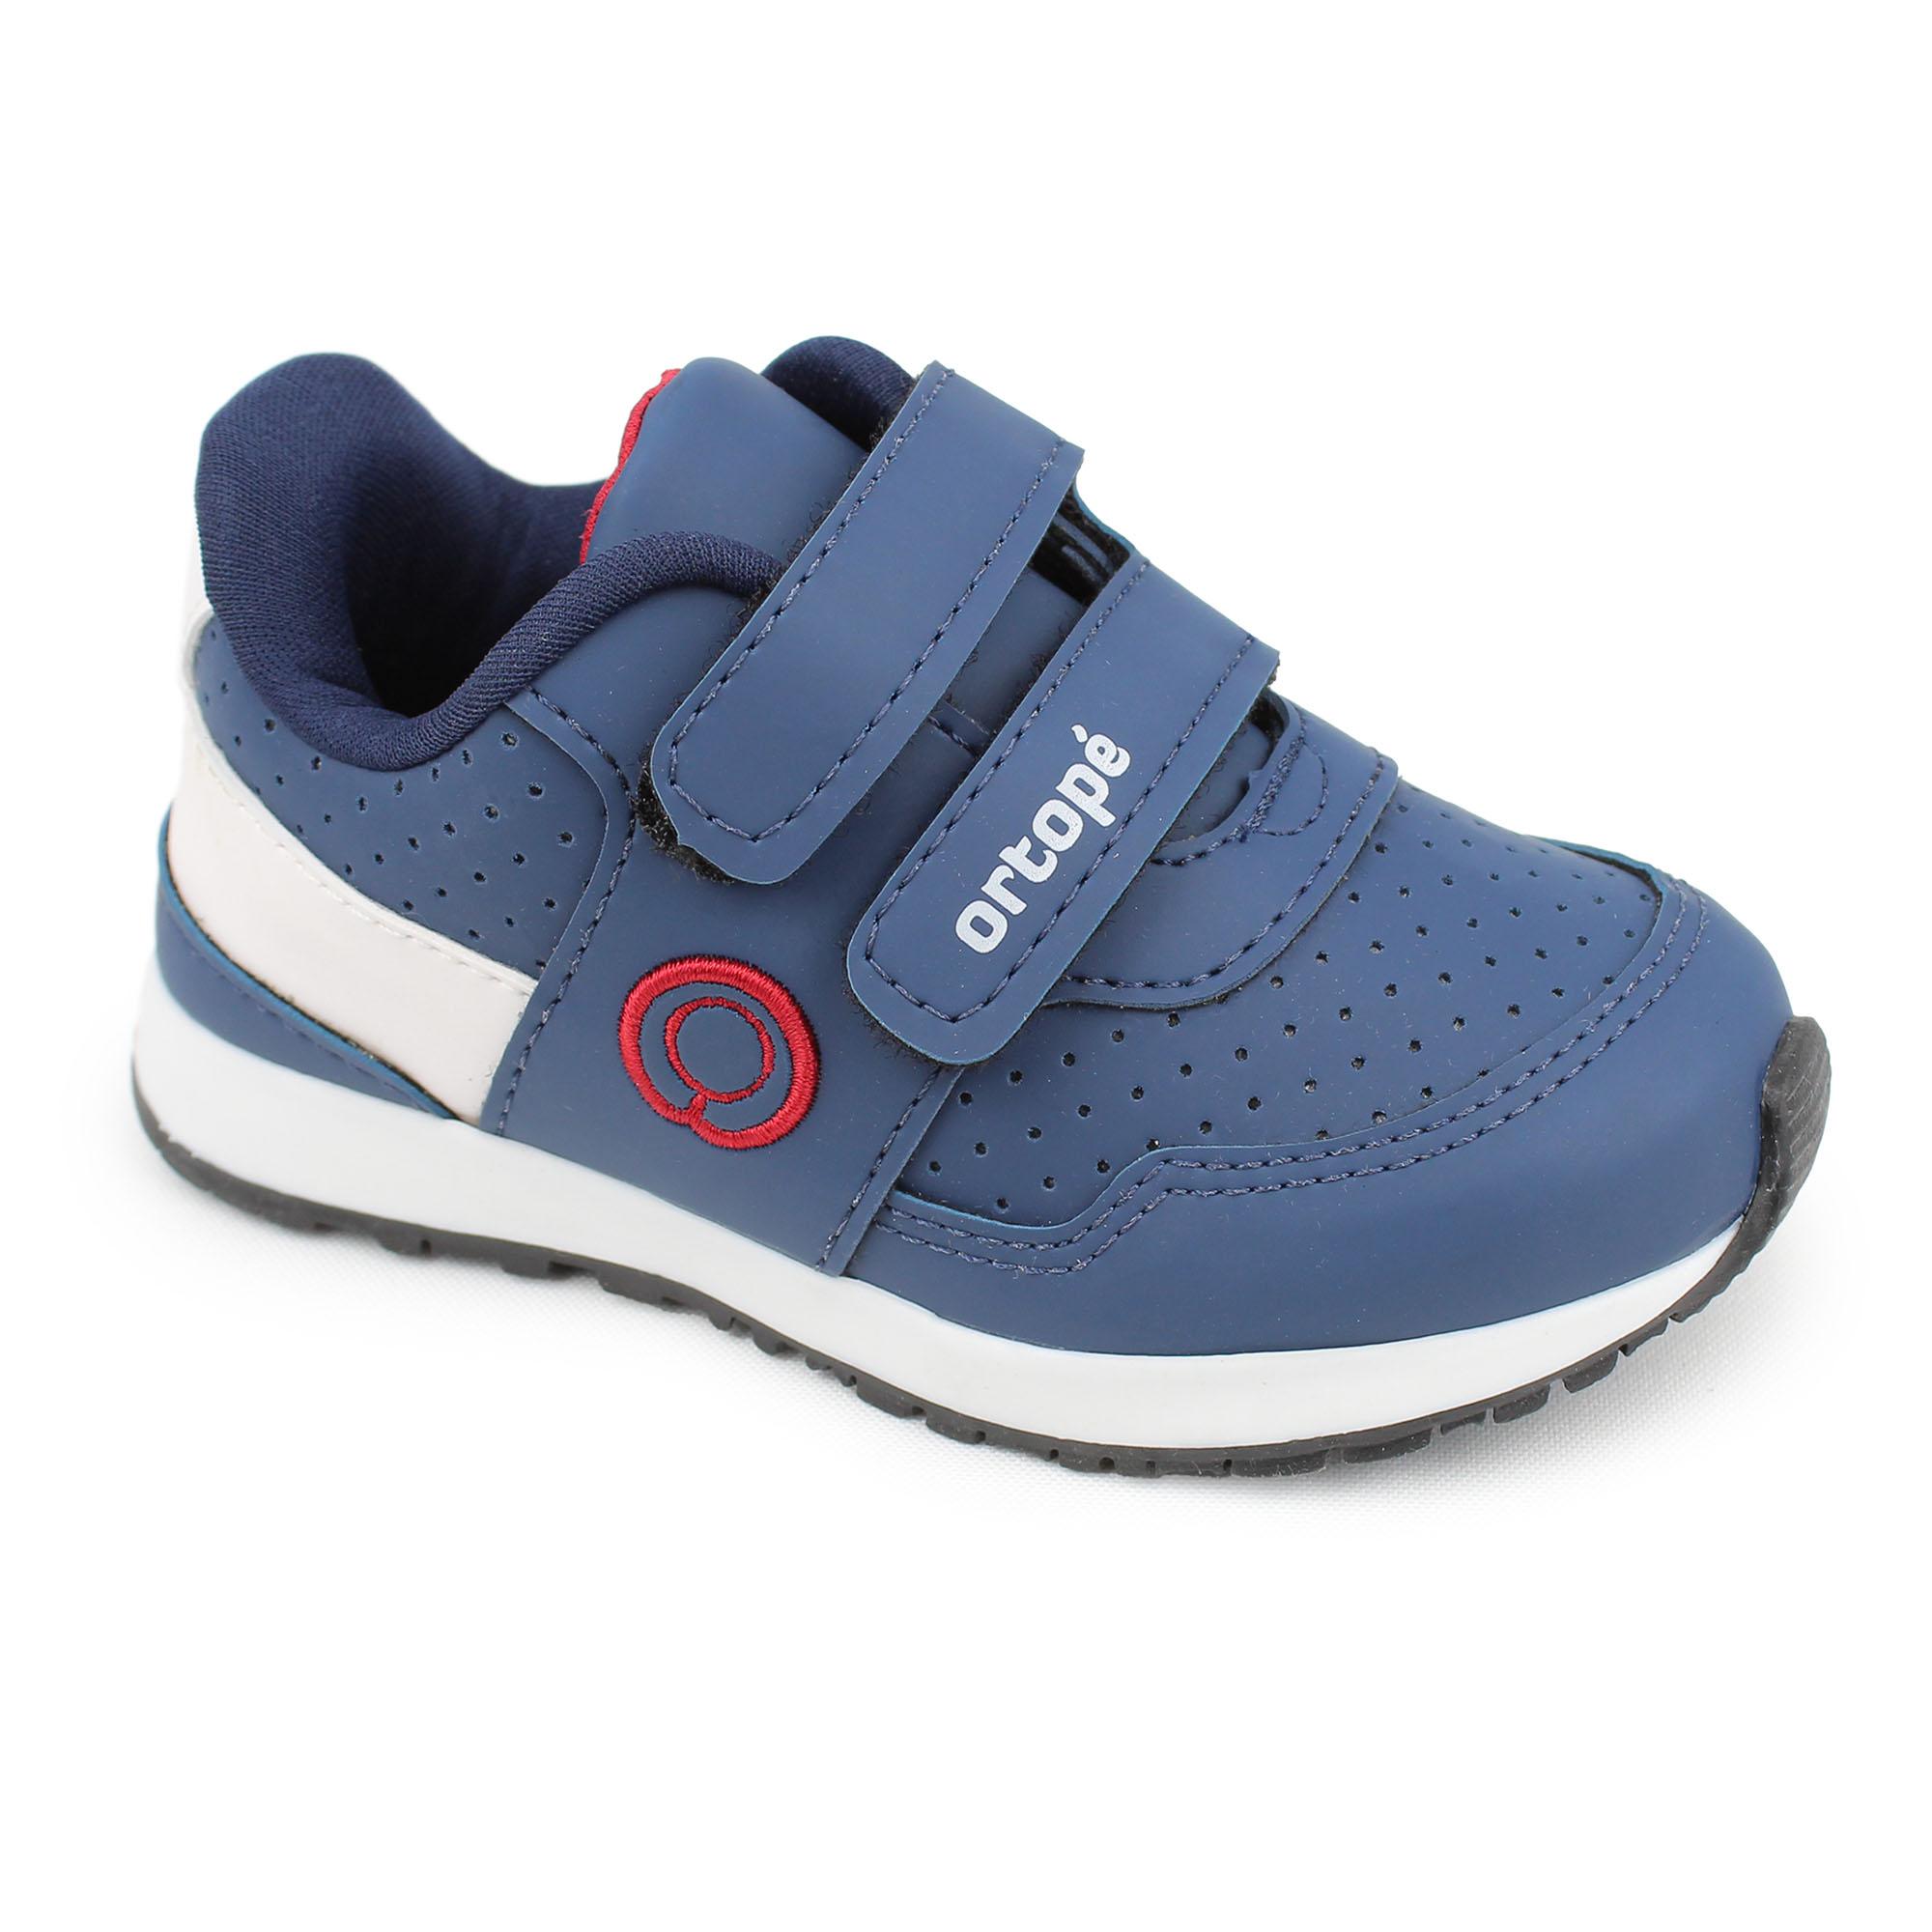 Tênis Bebê Ortopé Jogger Jr. 23170013 Menino